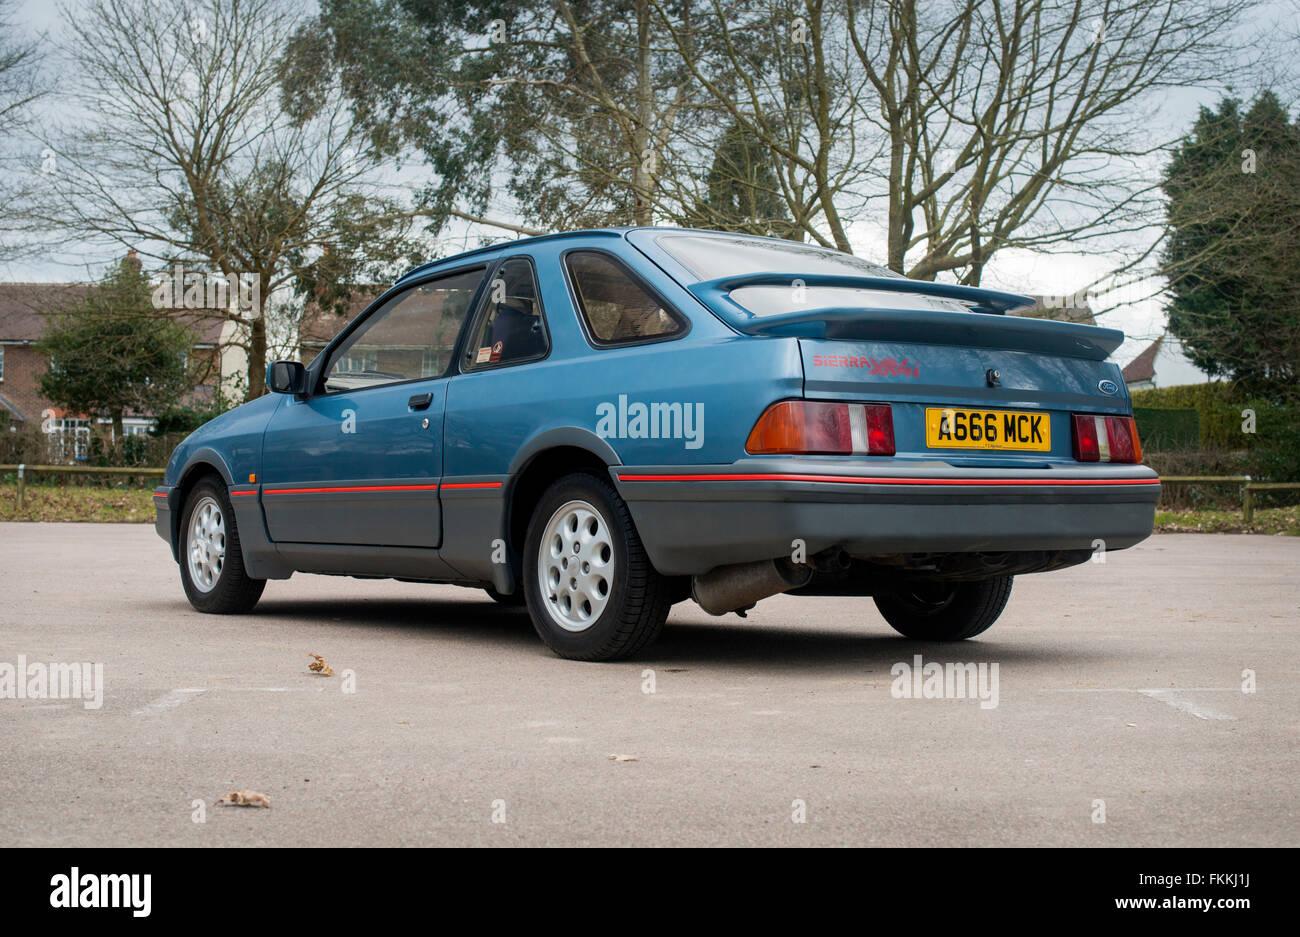 1983 Ford Sierra XR4i car sold in America as the Merkur XR4Ti - Stock Image